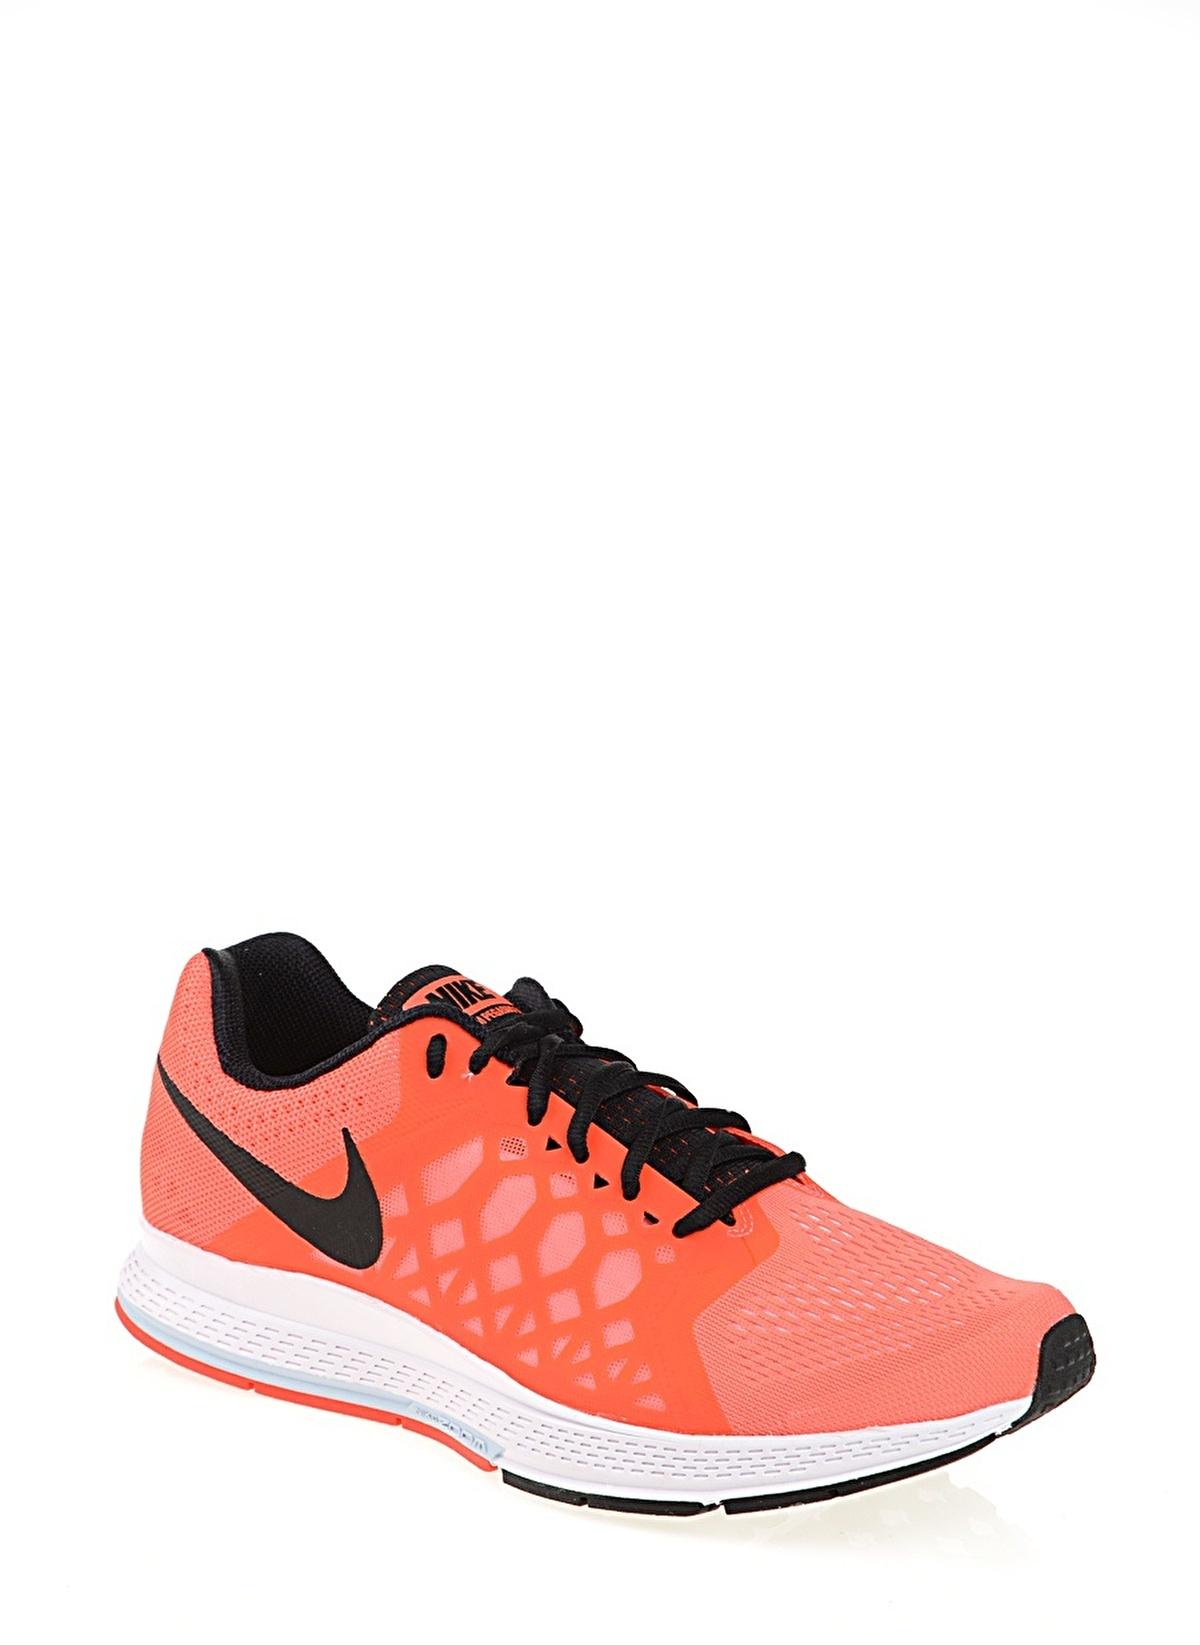 Cesta Enumerar Grande  Nike Erkek Nike Air Zoom Pegasus 31 Hot Lava/Black-White-Antrctc | Morhipo  | 14406617